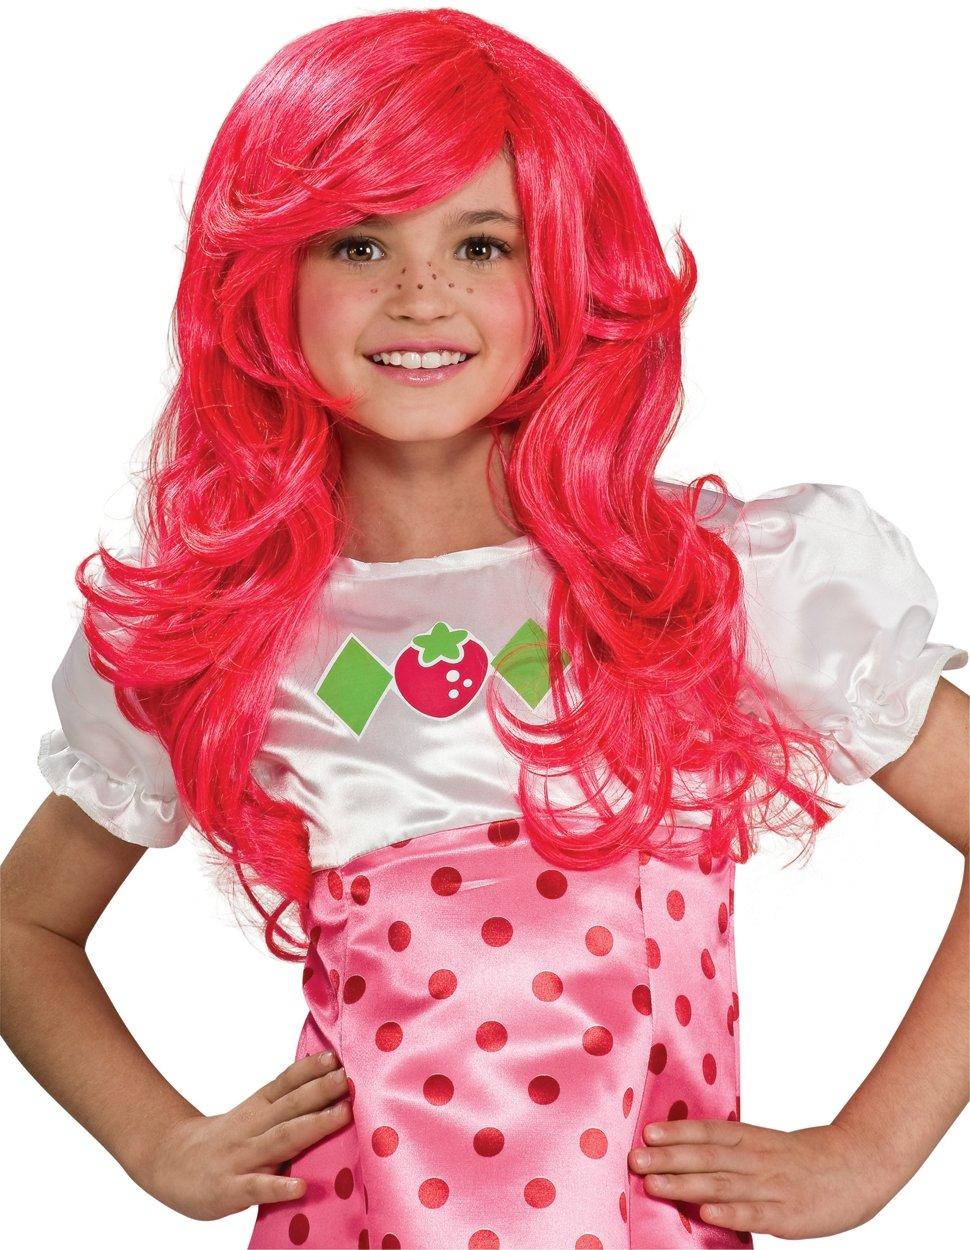 Strawberry Shortcake Wig Costume Accessory by Rubie's (Image #1)